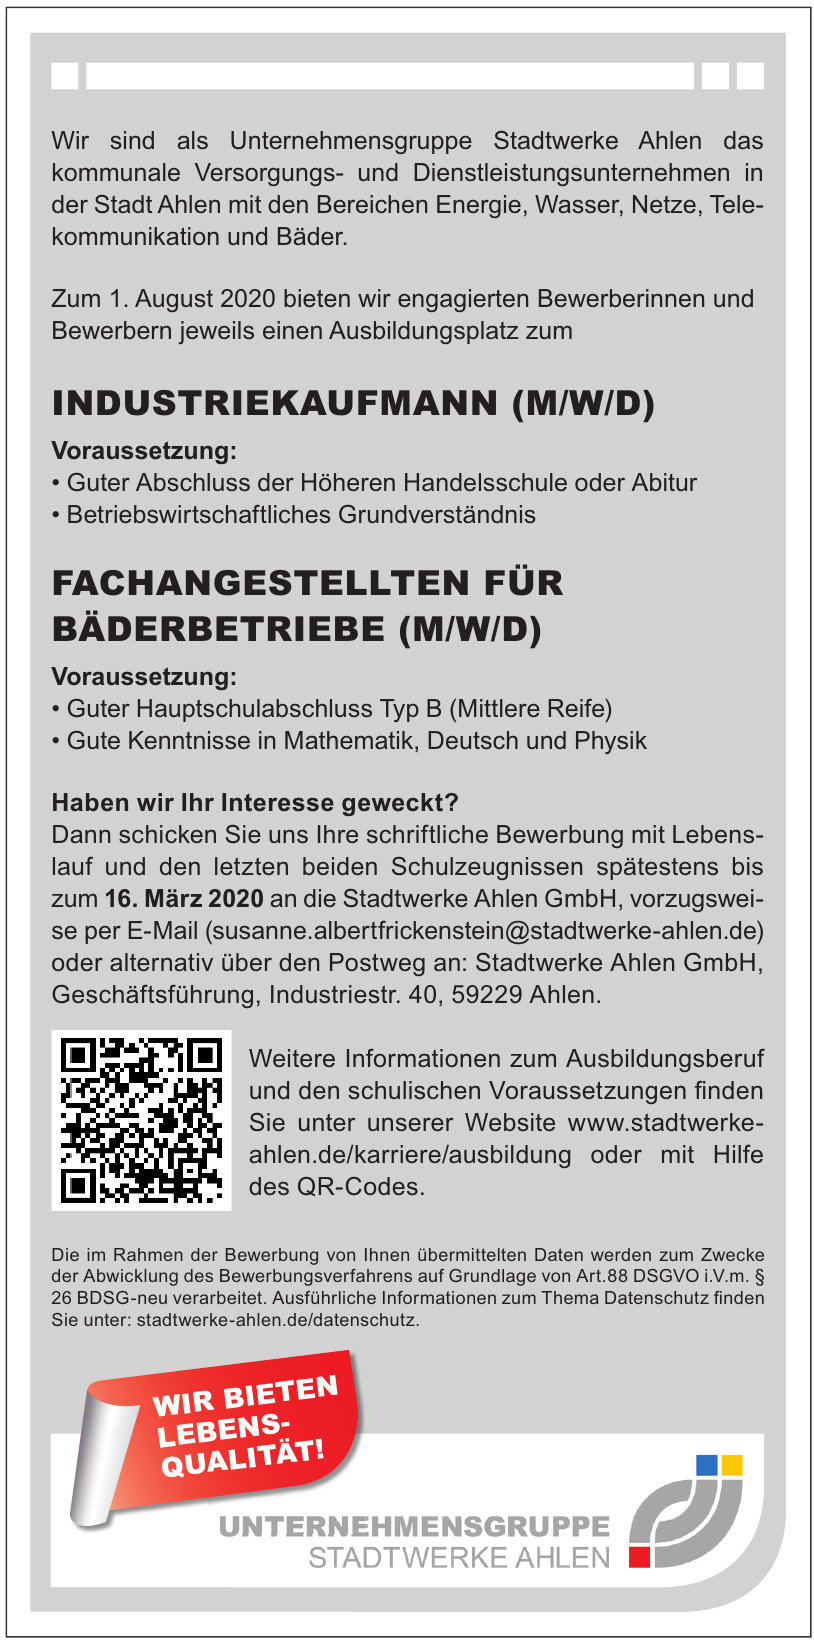 Stadtwerke Ahlen GmbH